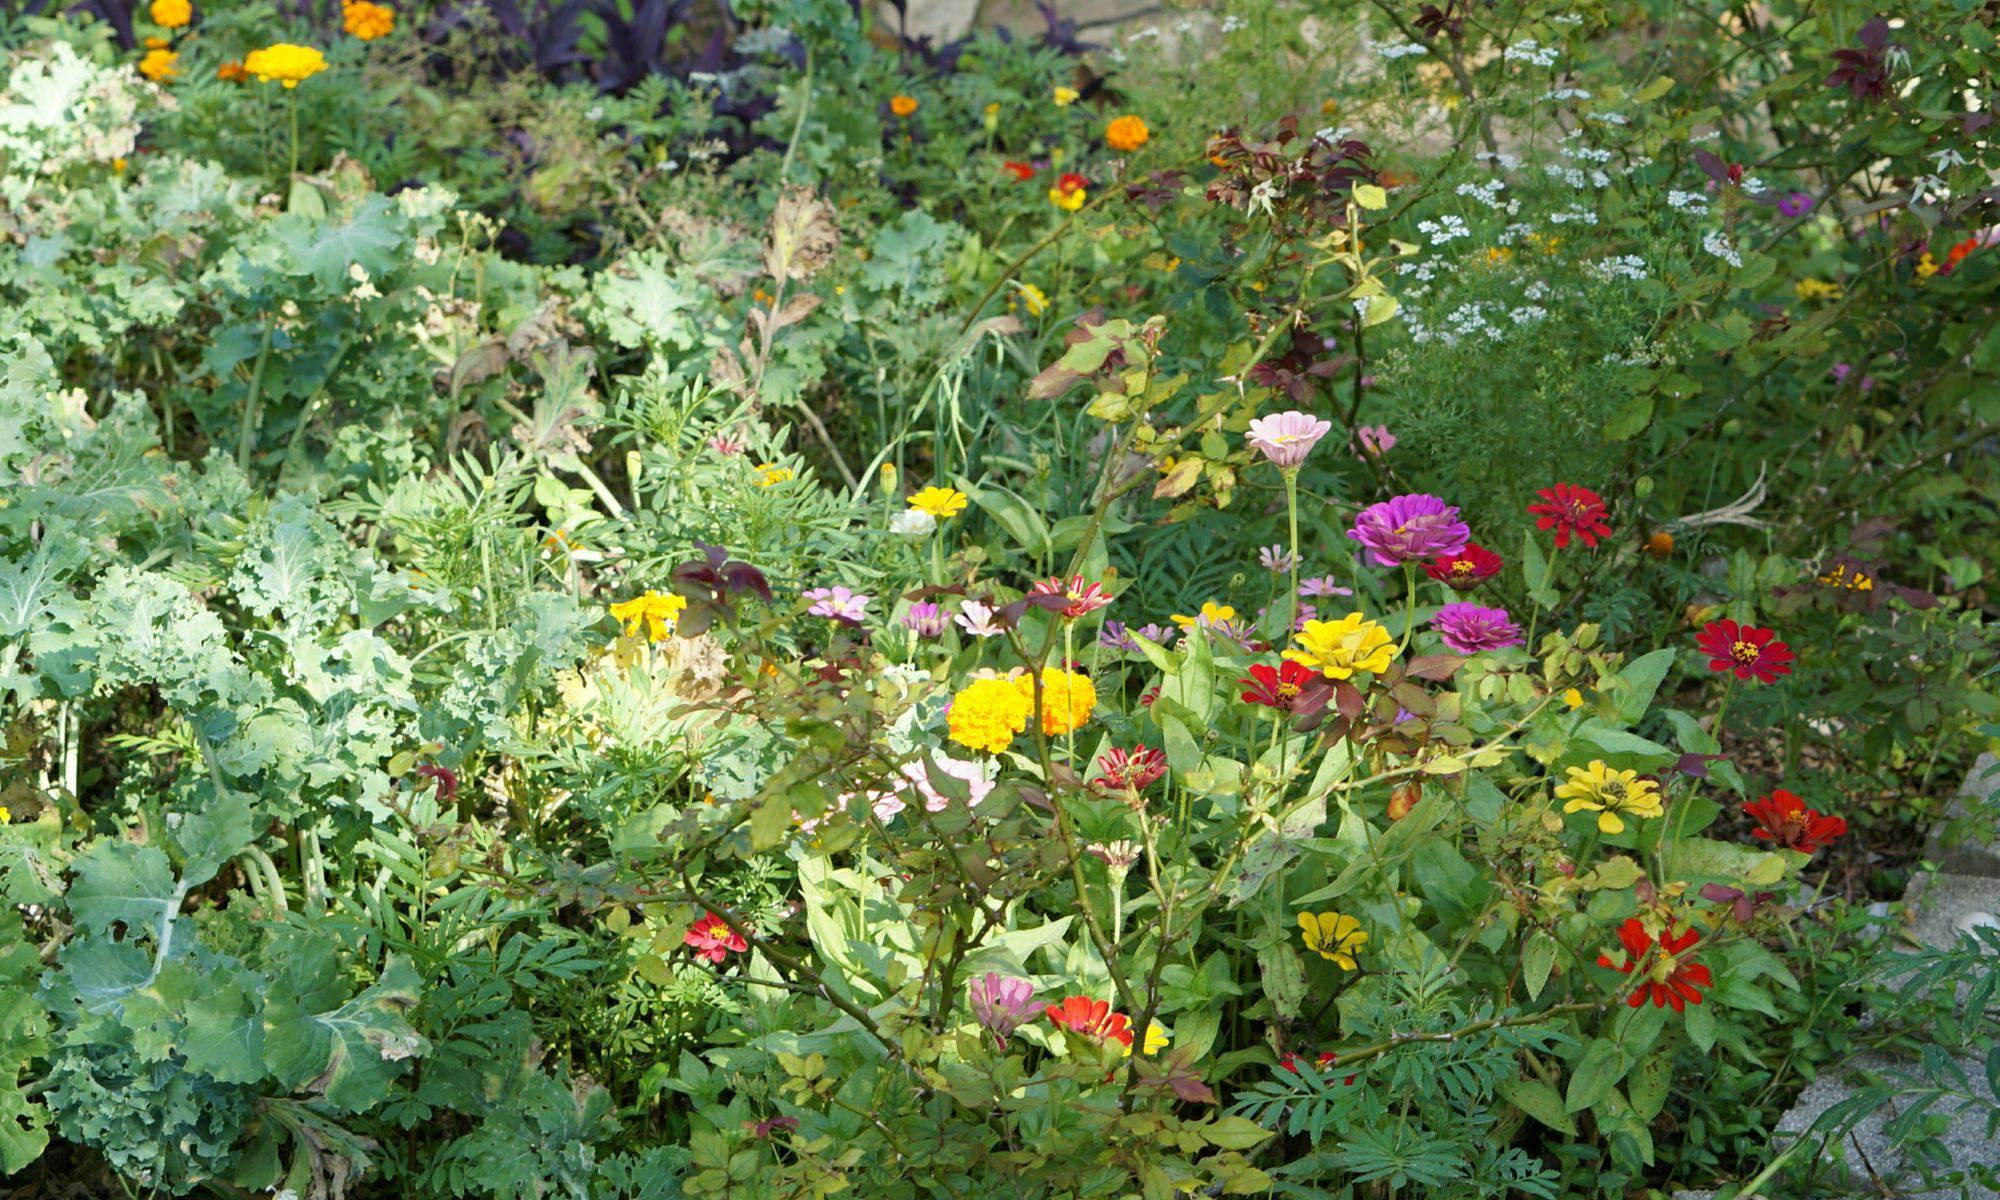 Ecnomics of growing food